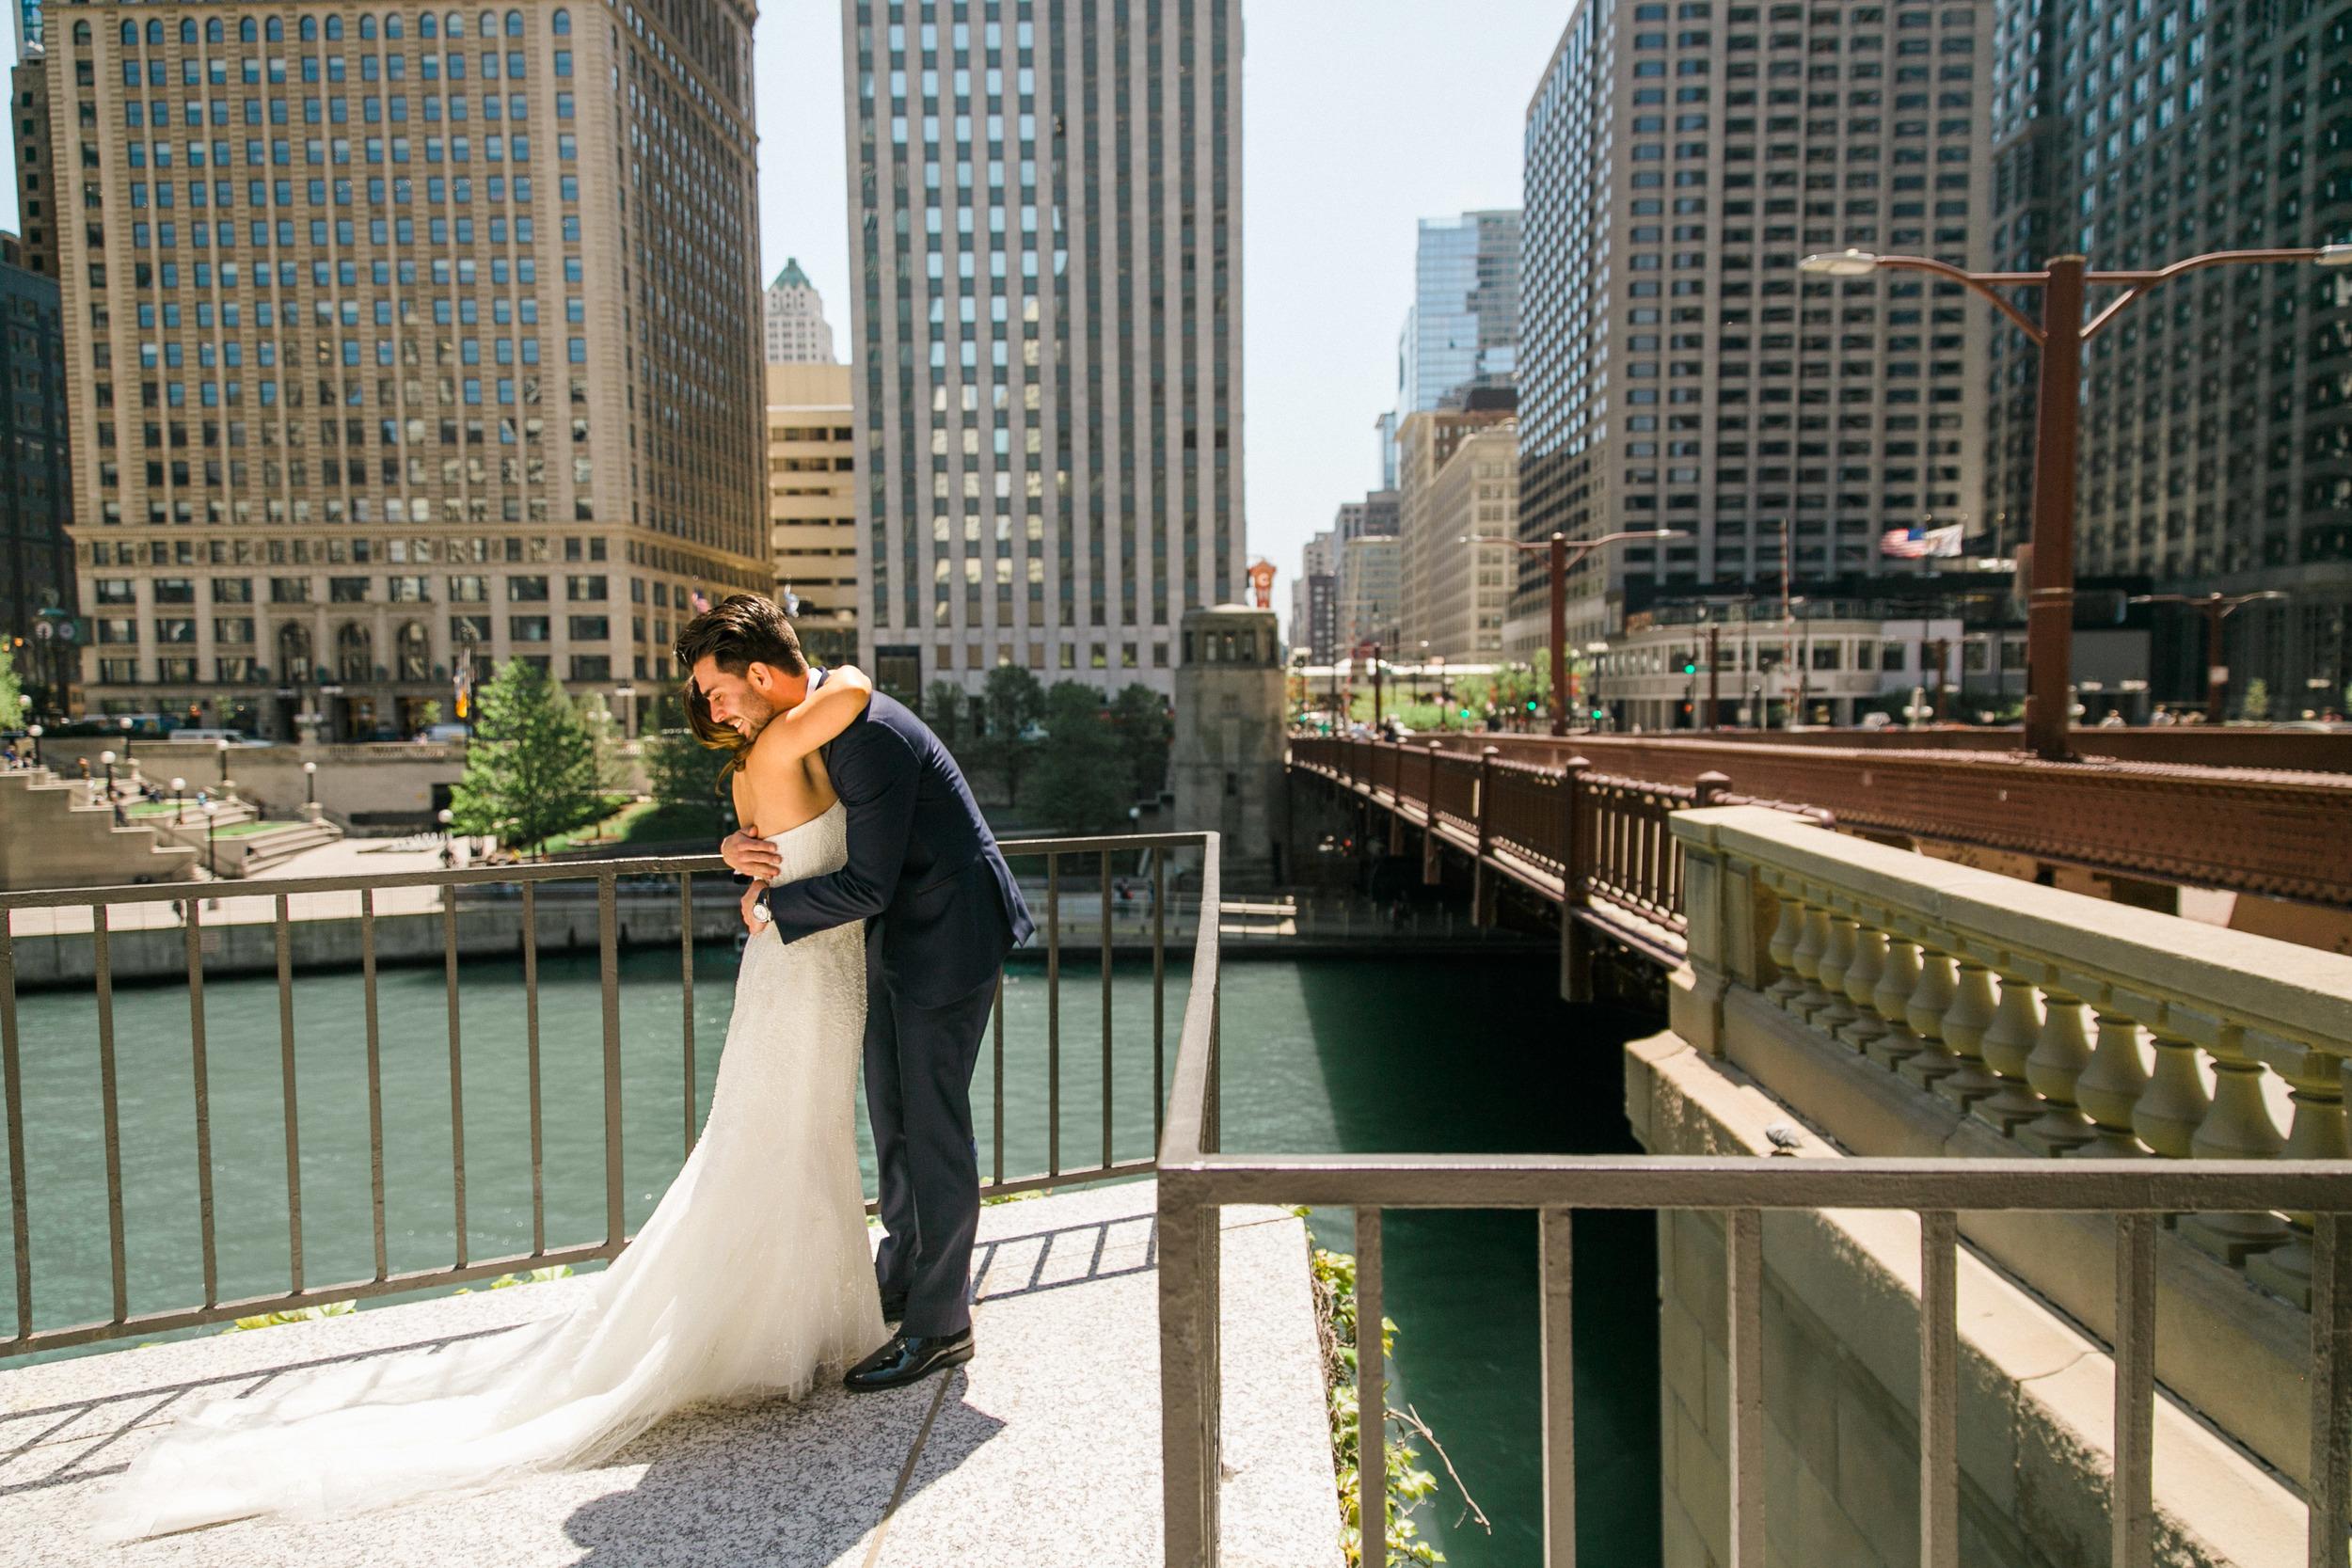 mayden_photography_weddings-33.jpg